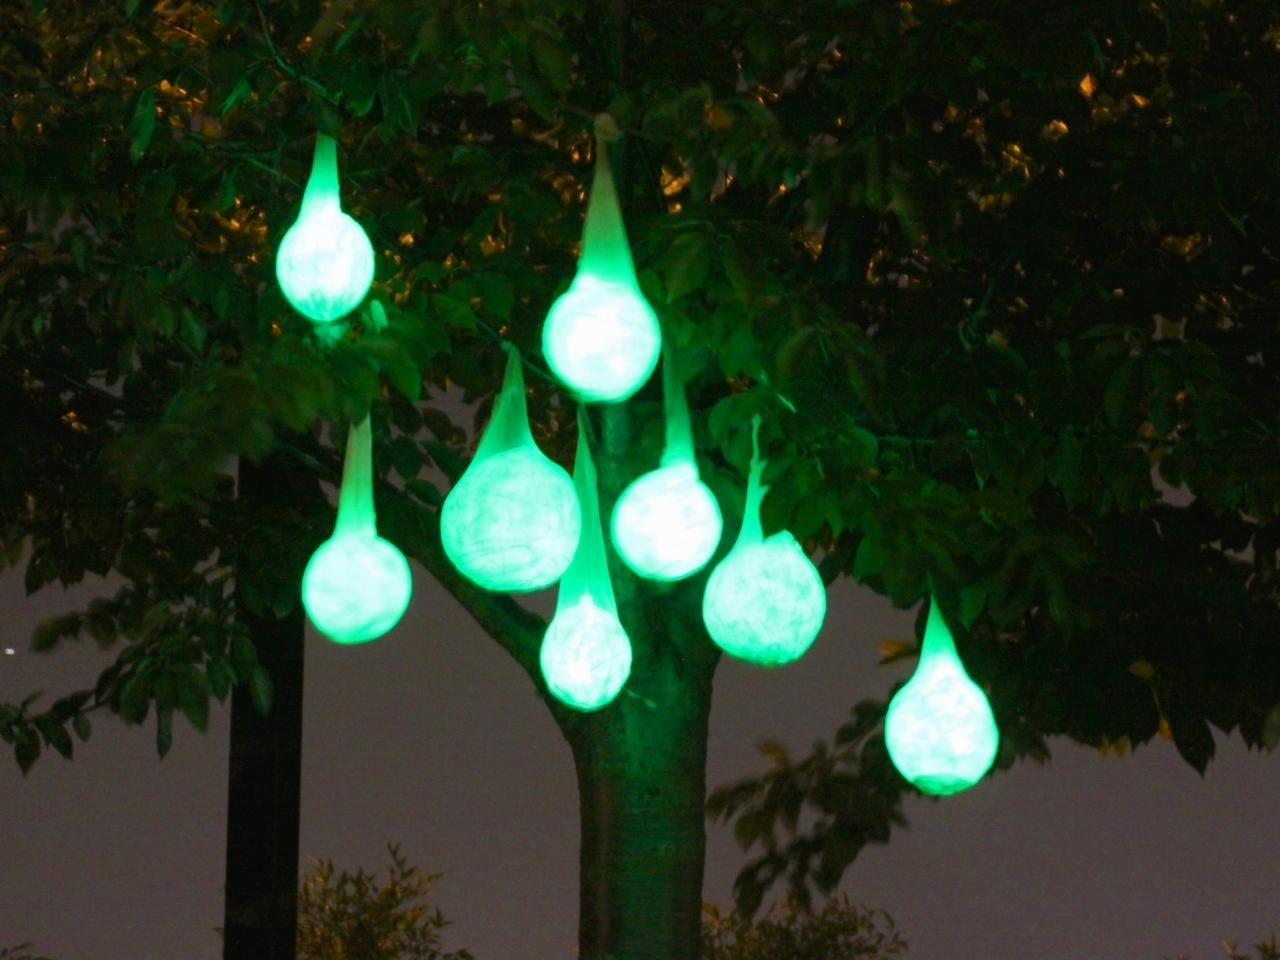 Diy : How Make Glowing Halloween Light Pods Hanging Lights Paper With Regard To Outdoor Hanging Lights At Walmart (#7 of 15)